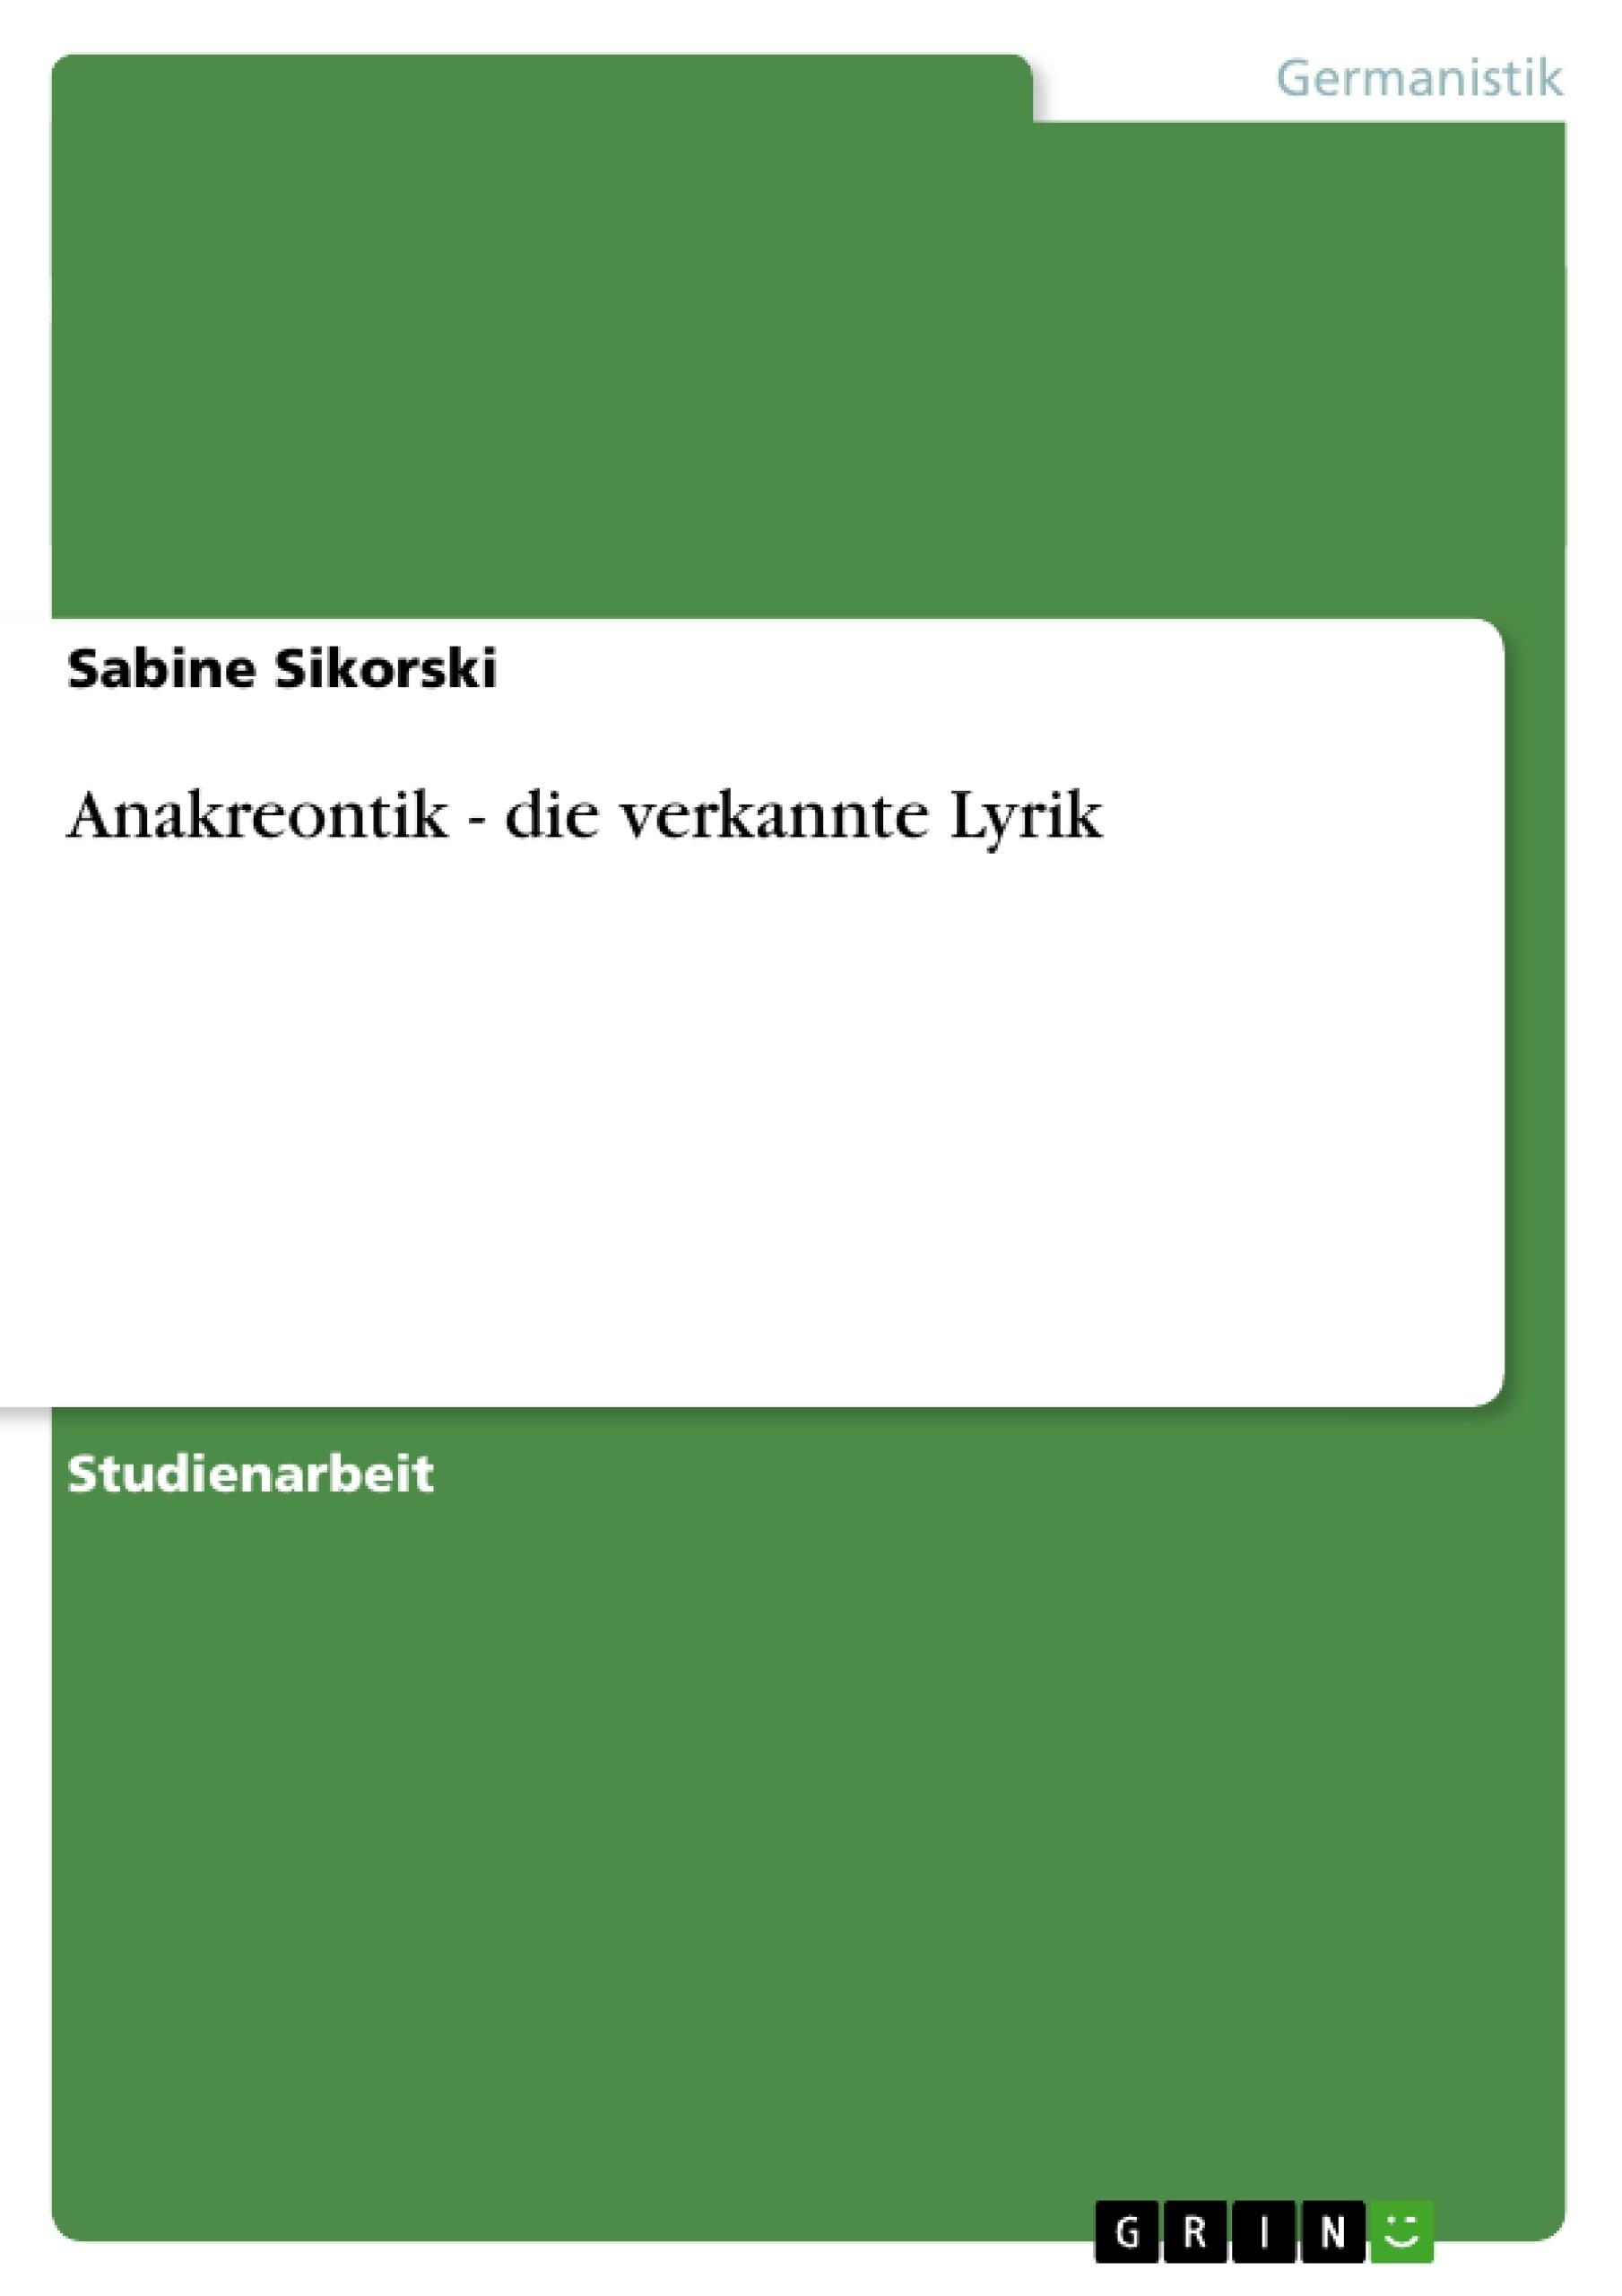 Titel: Anakreontik - die verkannte Lyrik